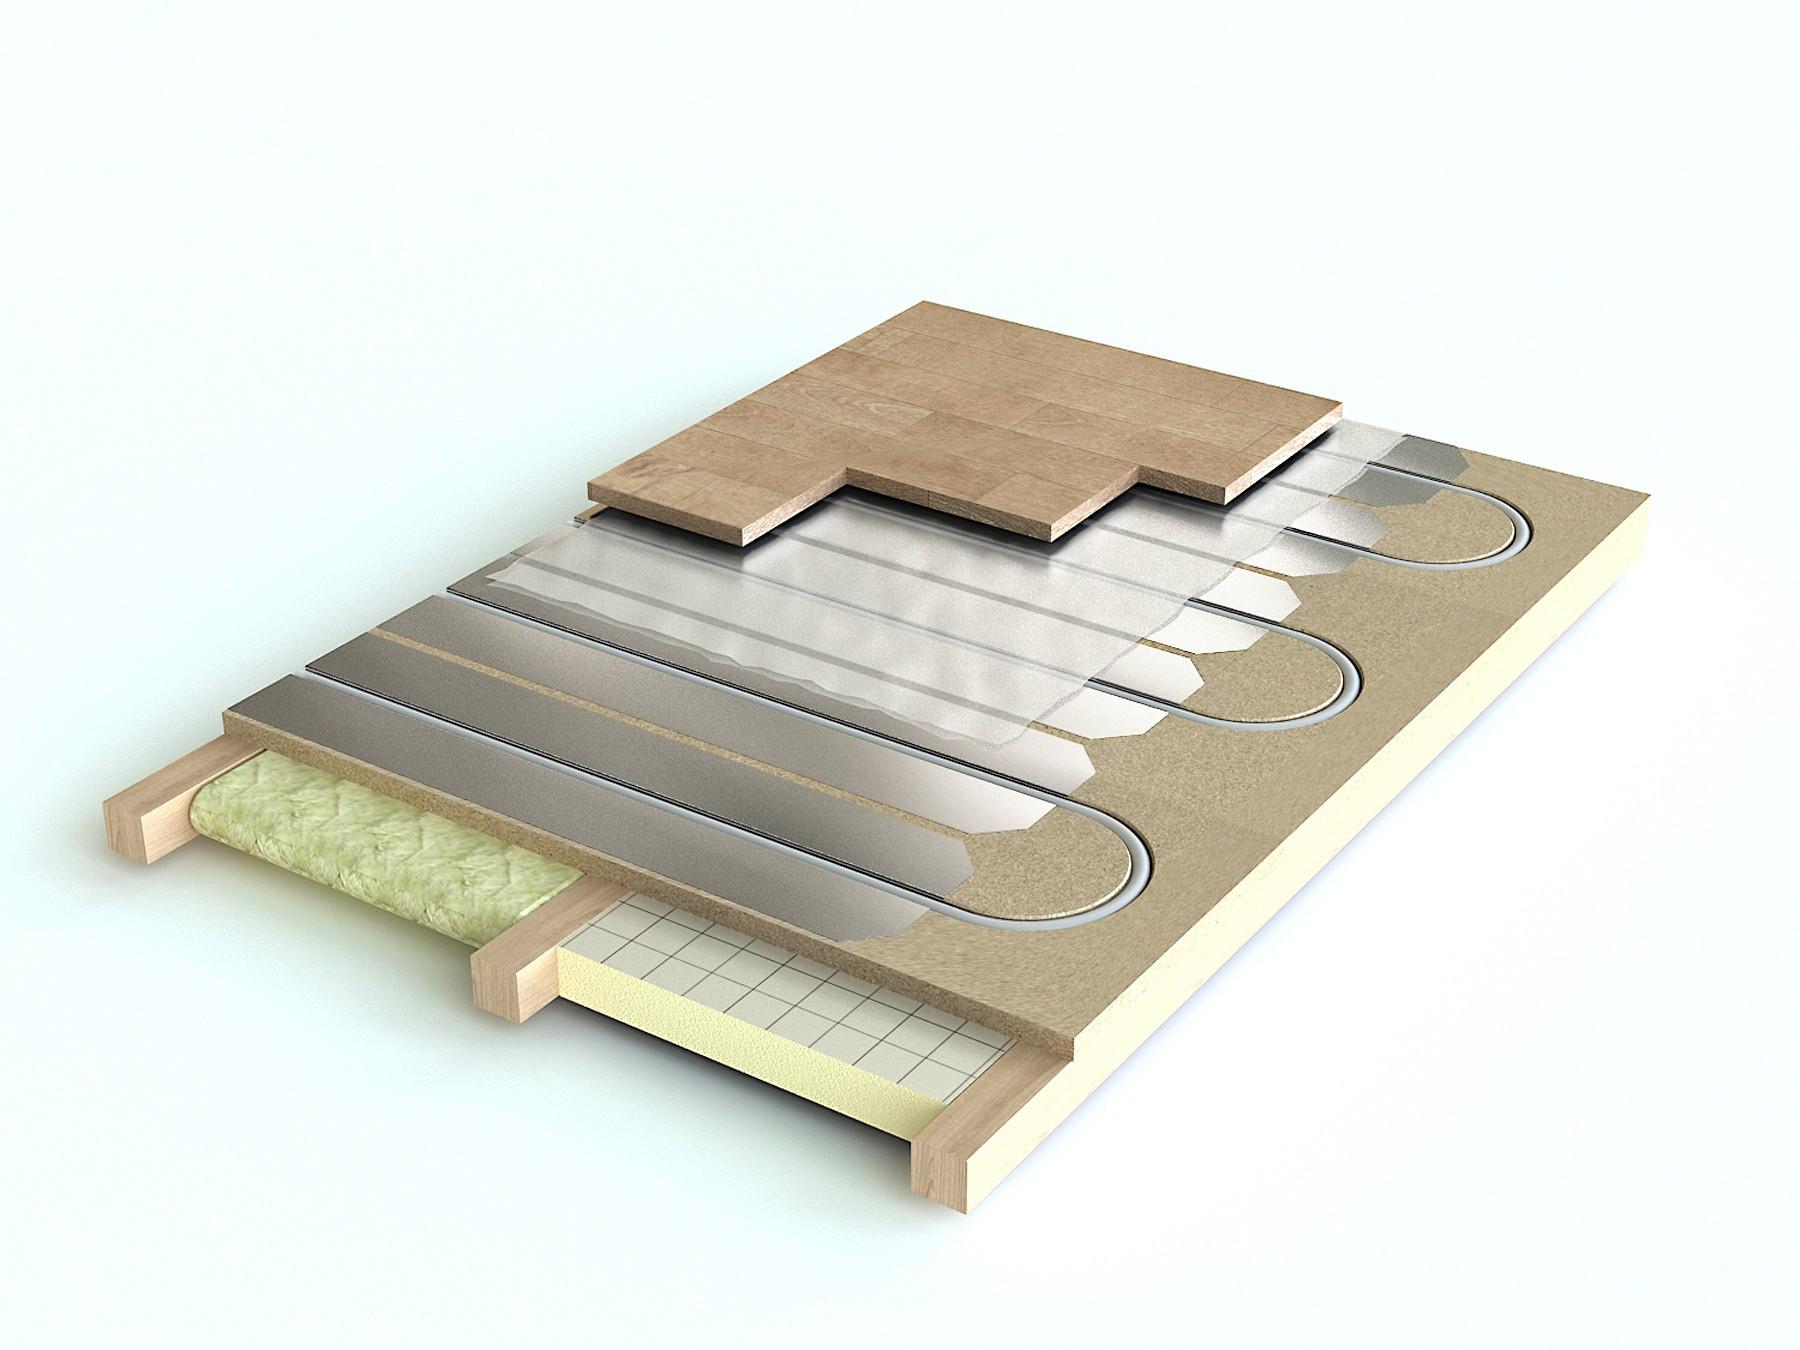 hardwood flooring albany ny of category decoration 139 sesa build com within wood 22 in floor heating under hardwood